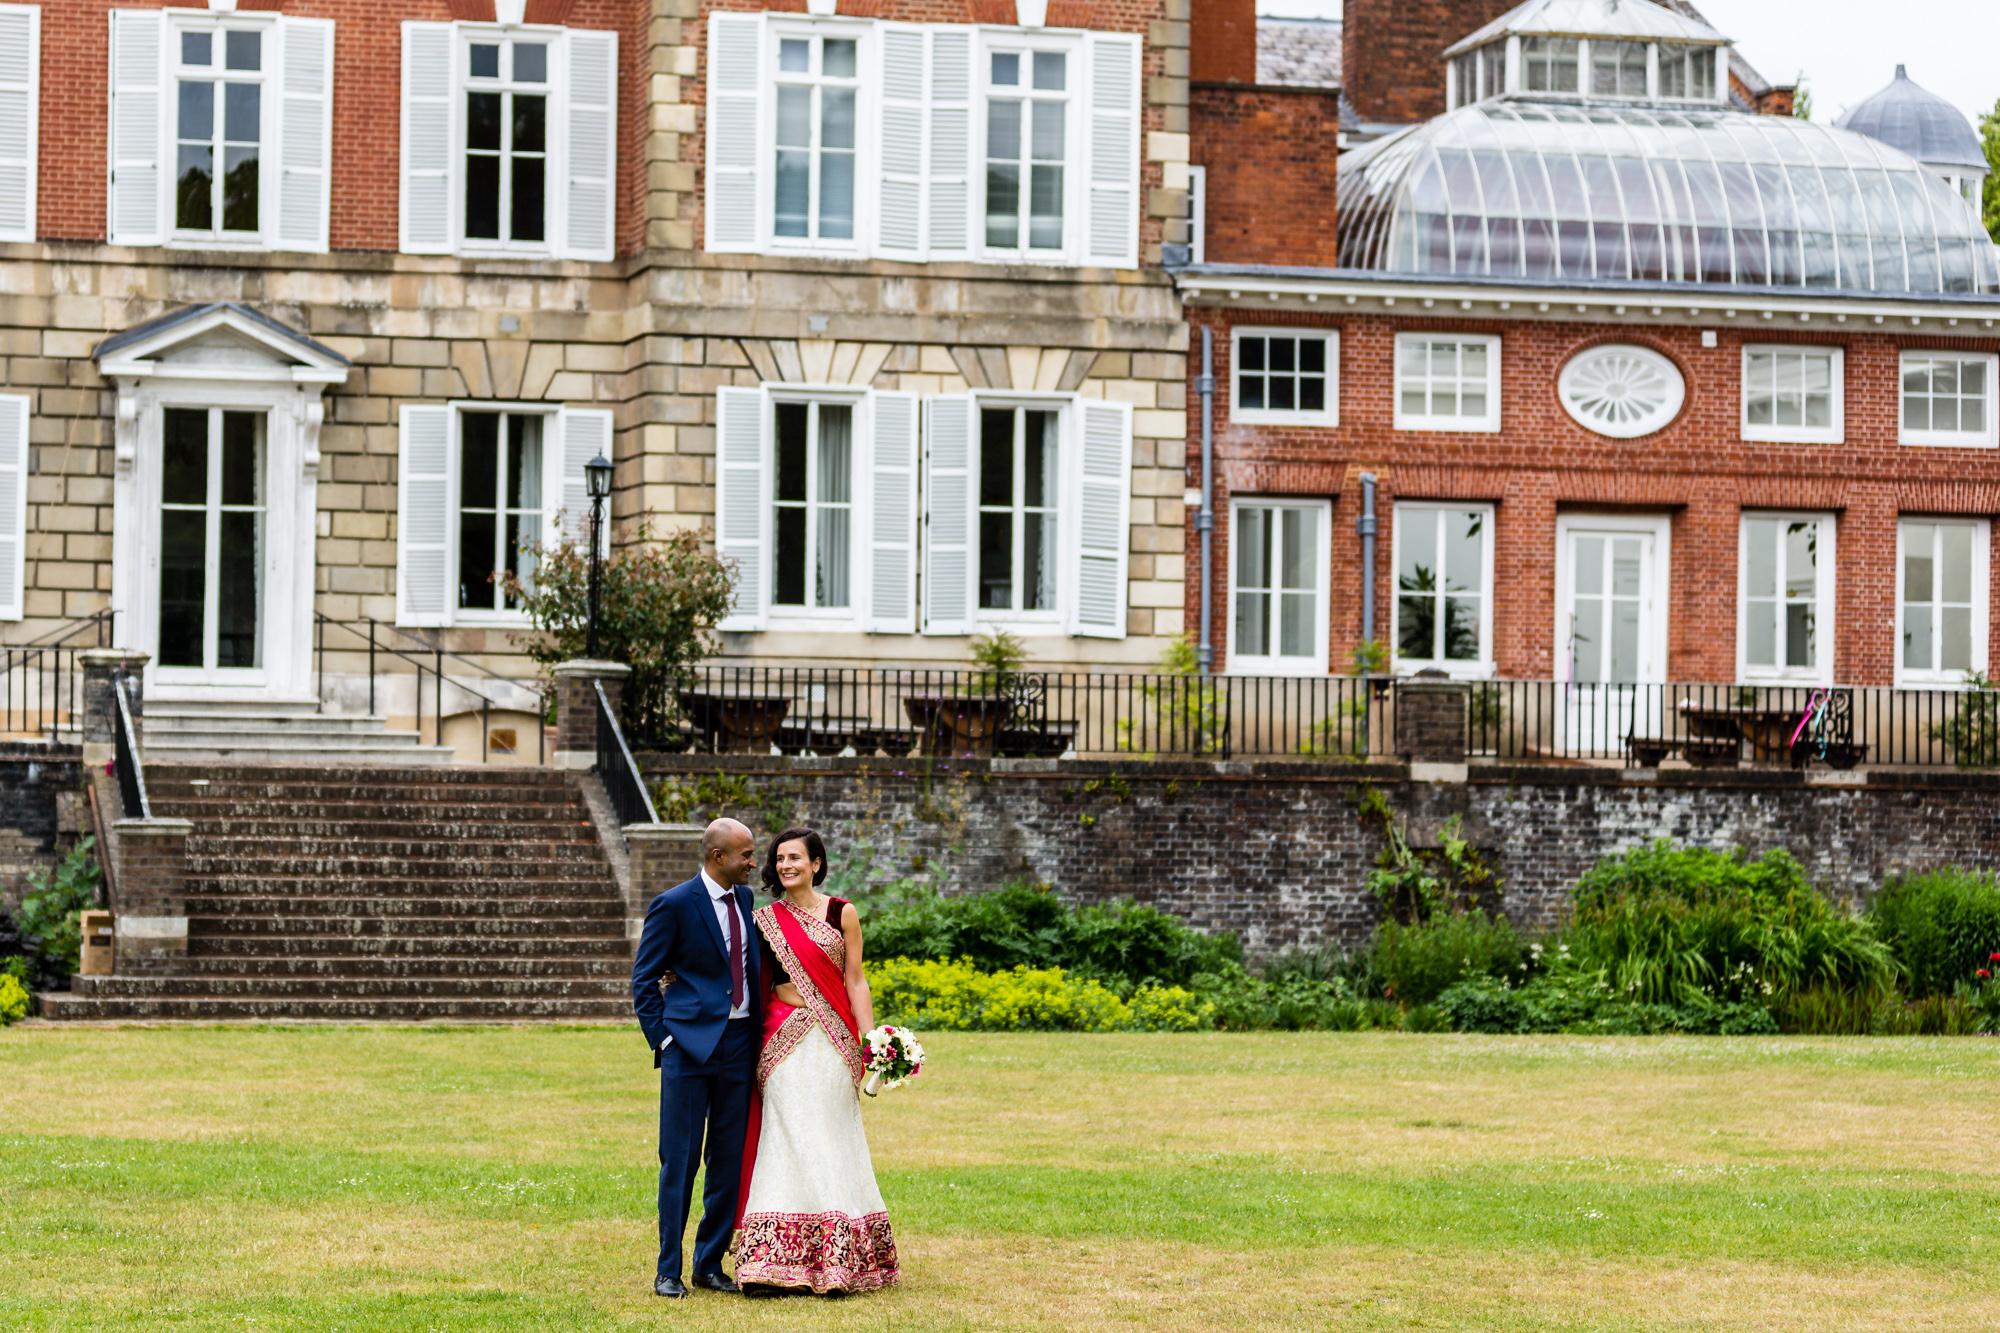 Wedding photography in Twickenham